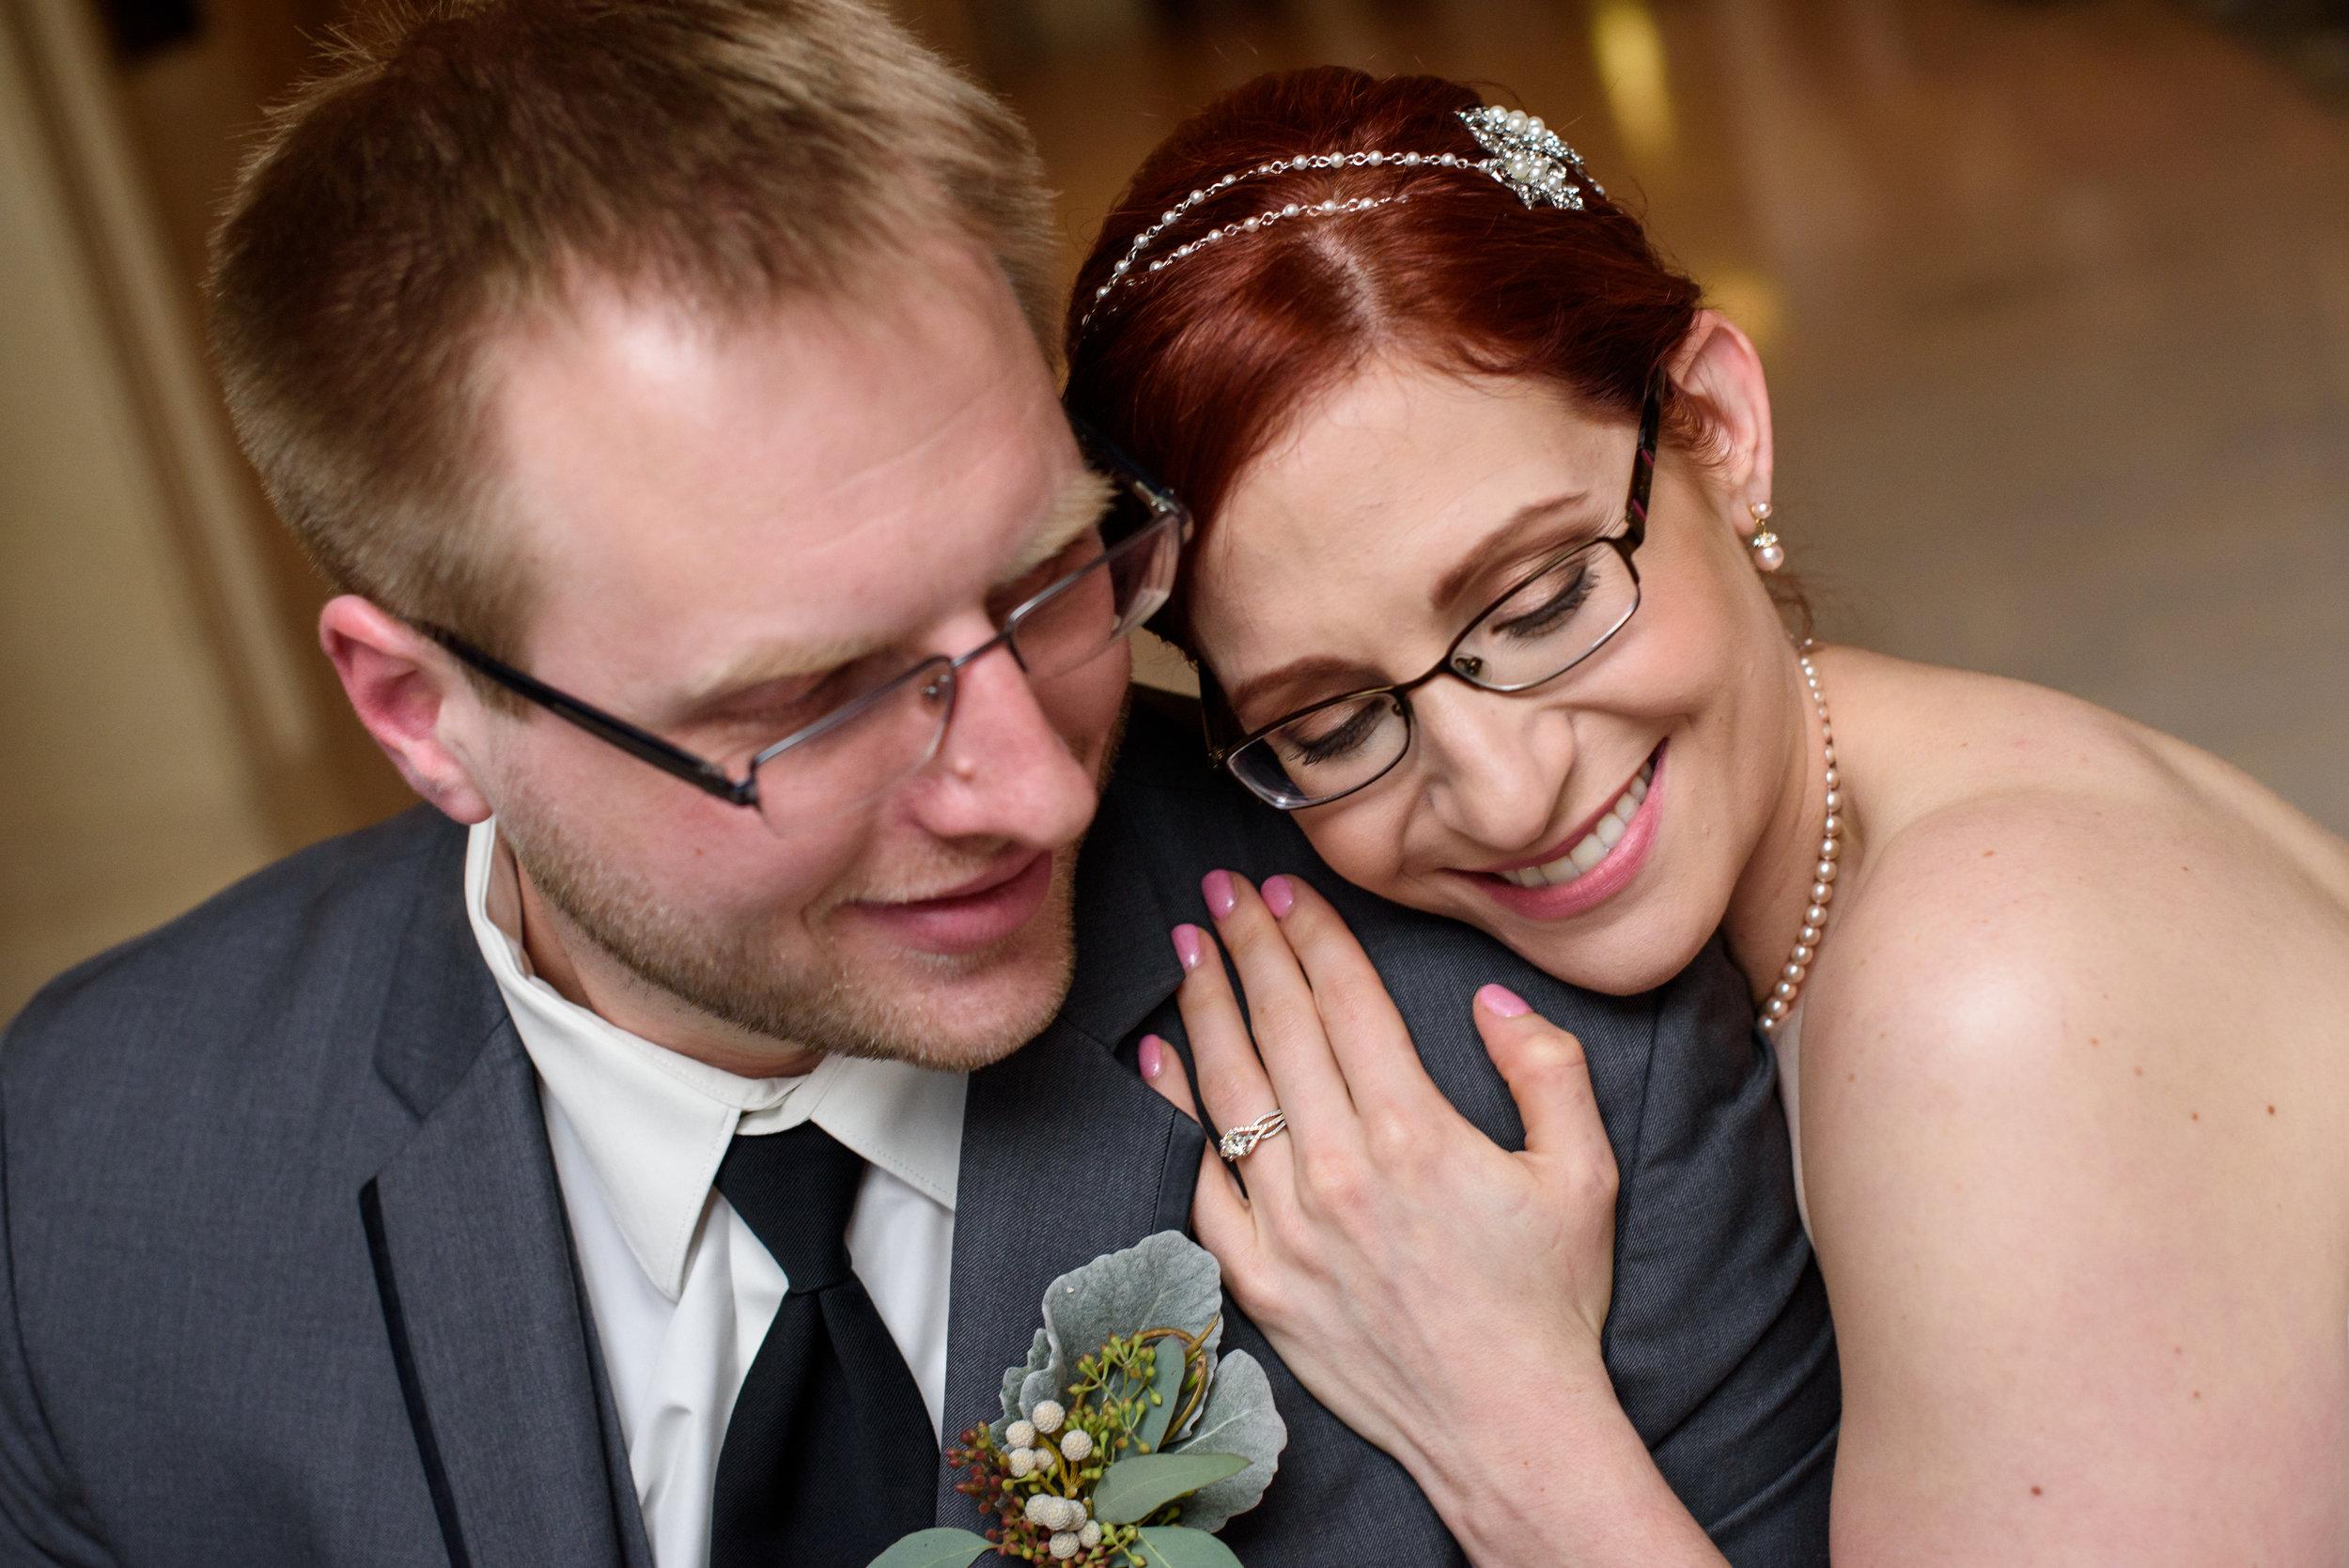 judith-john-016-citizen-hotel-sacramento-wedding-photographer-katherine-nicole-photography.JPG